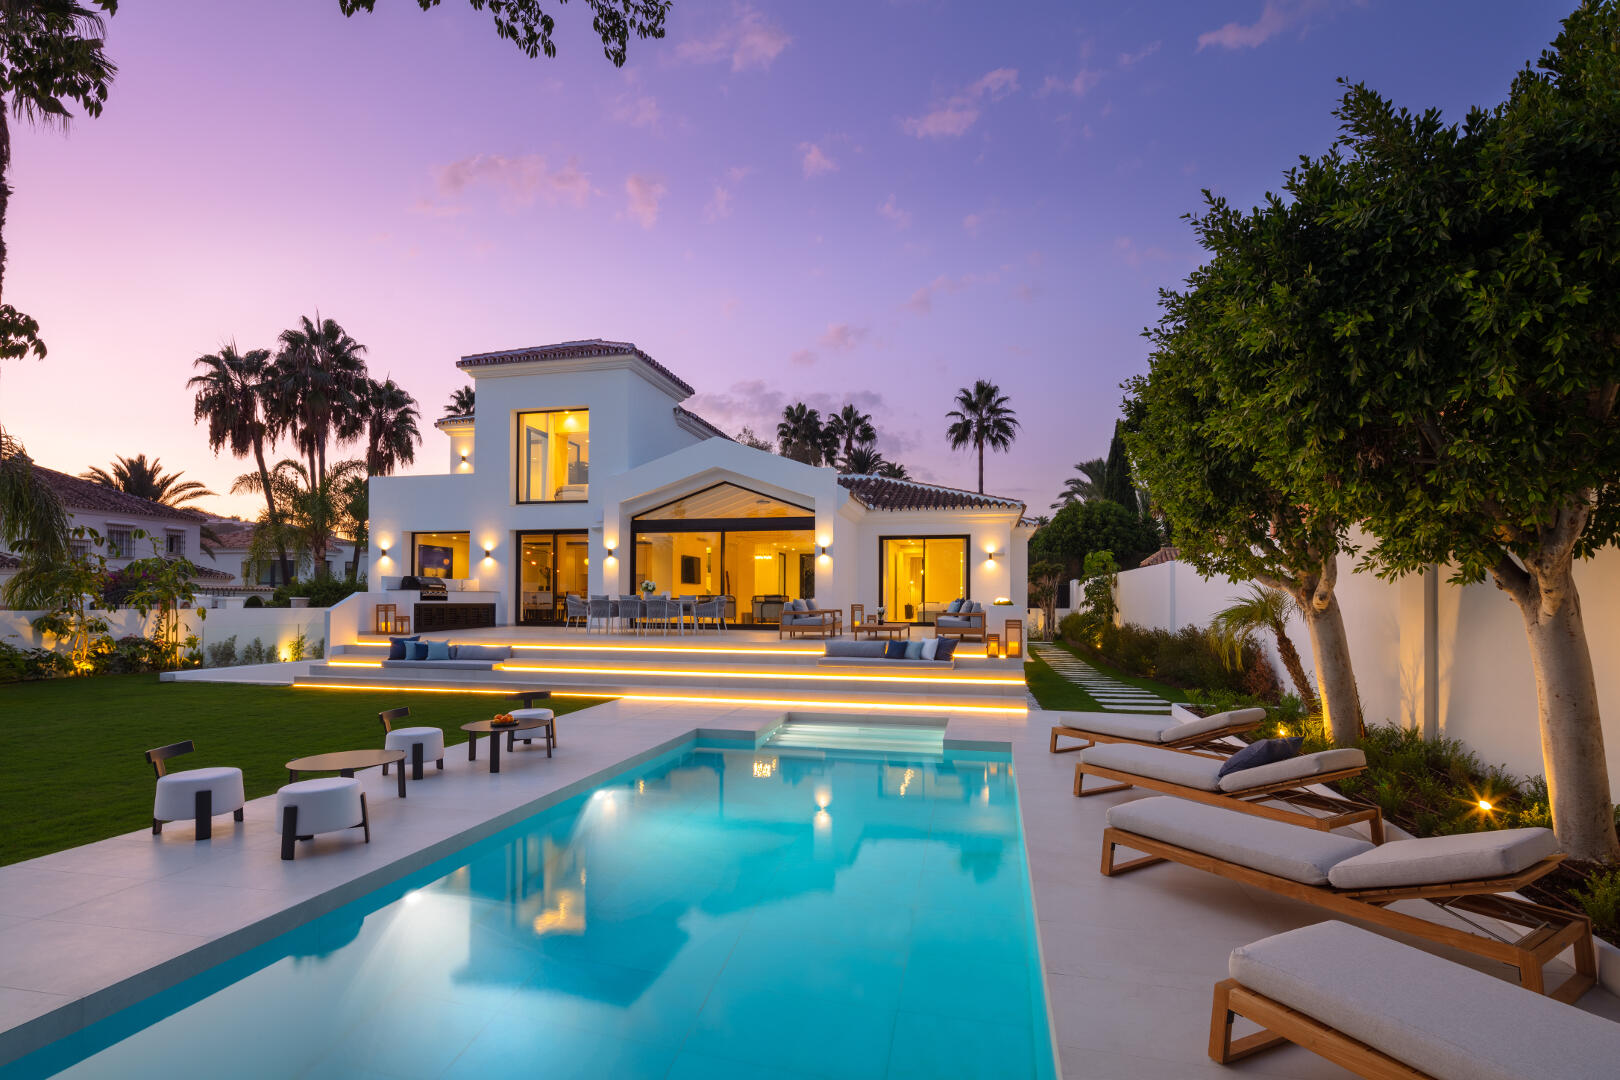 Villa Maripoza Nueva Andalucia_Realista Real Estate Marbella